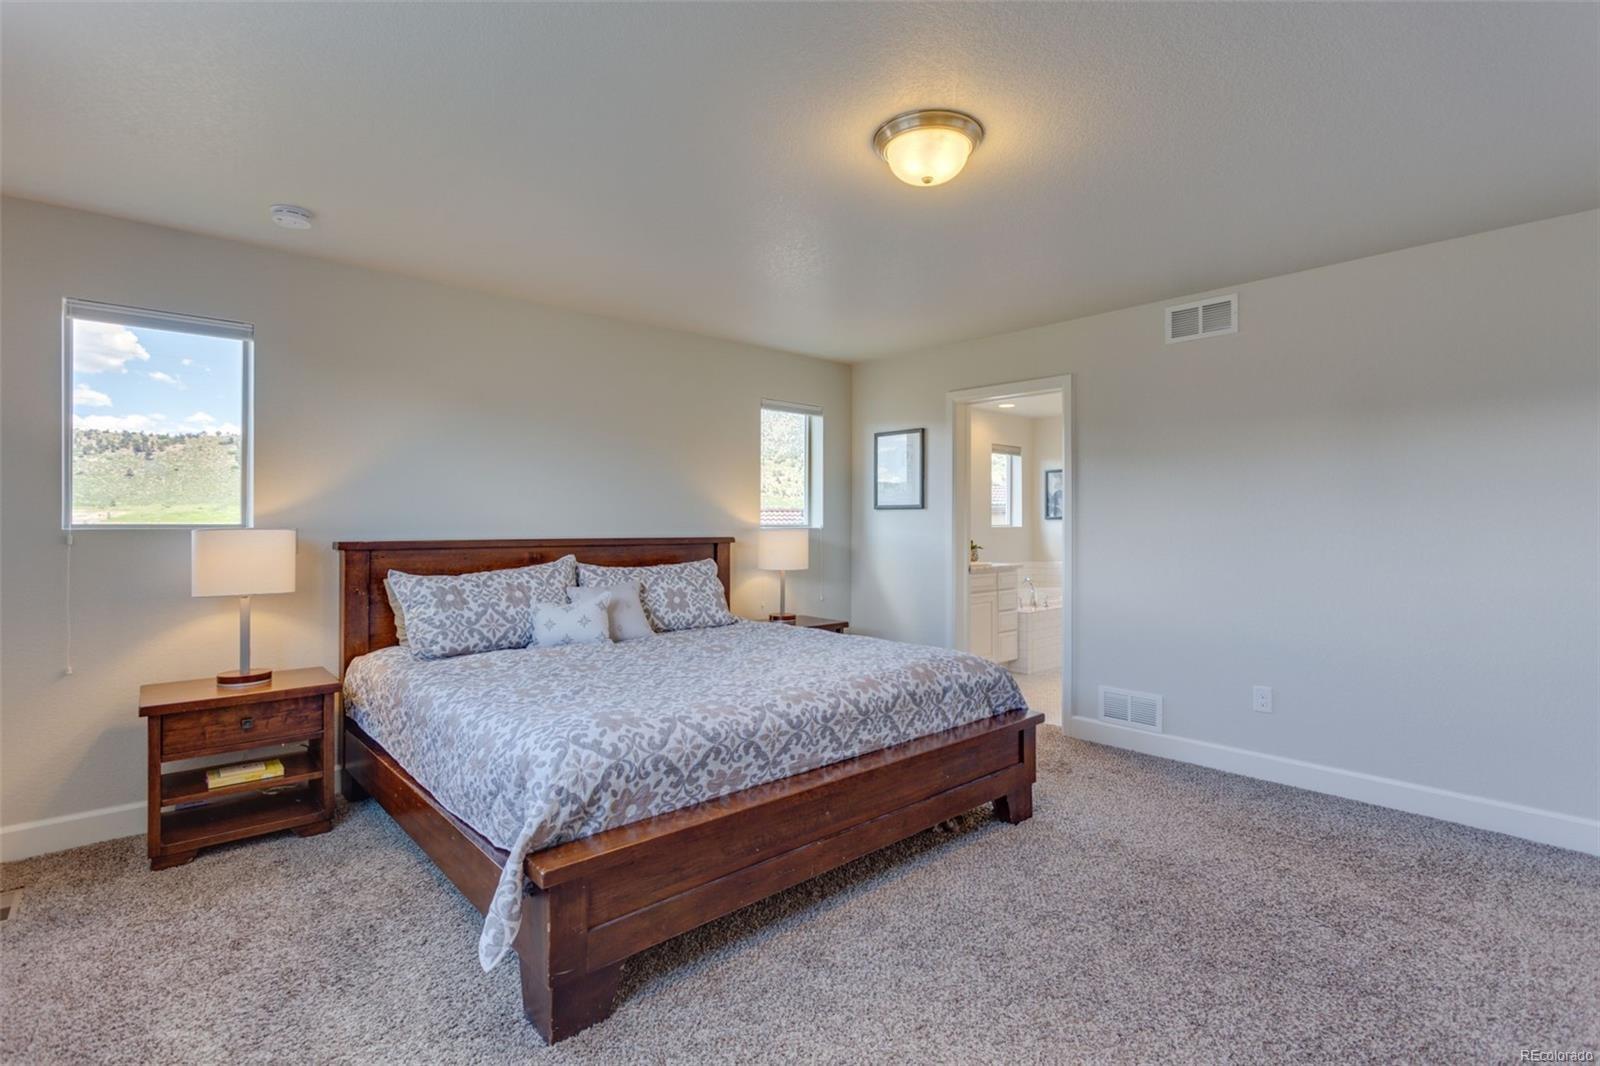 MLS# 4918733 - 1 - 2338  S Orchard Way, Lakewood, CO 80228